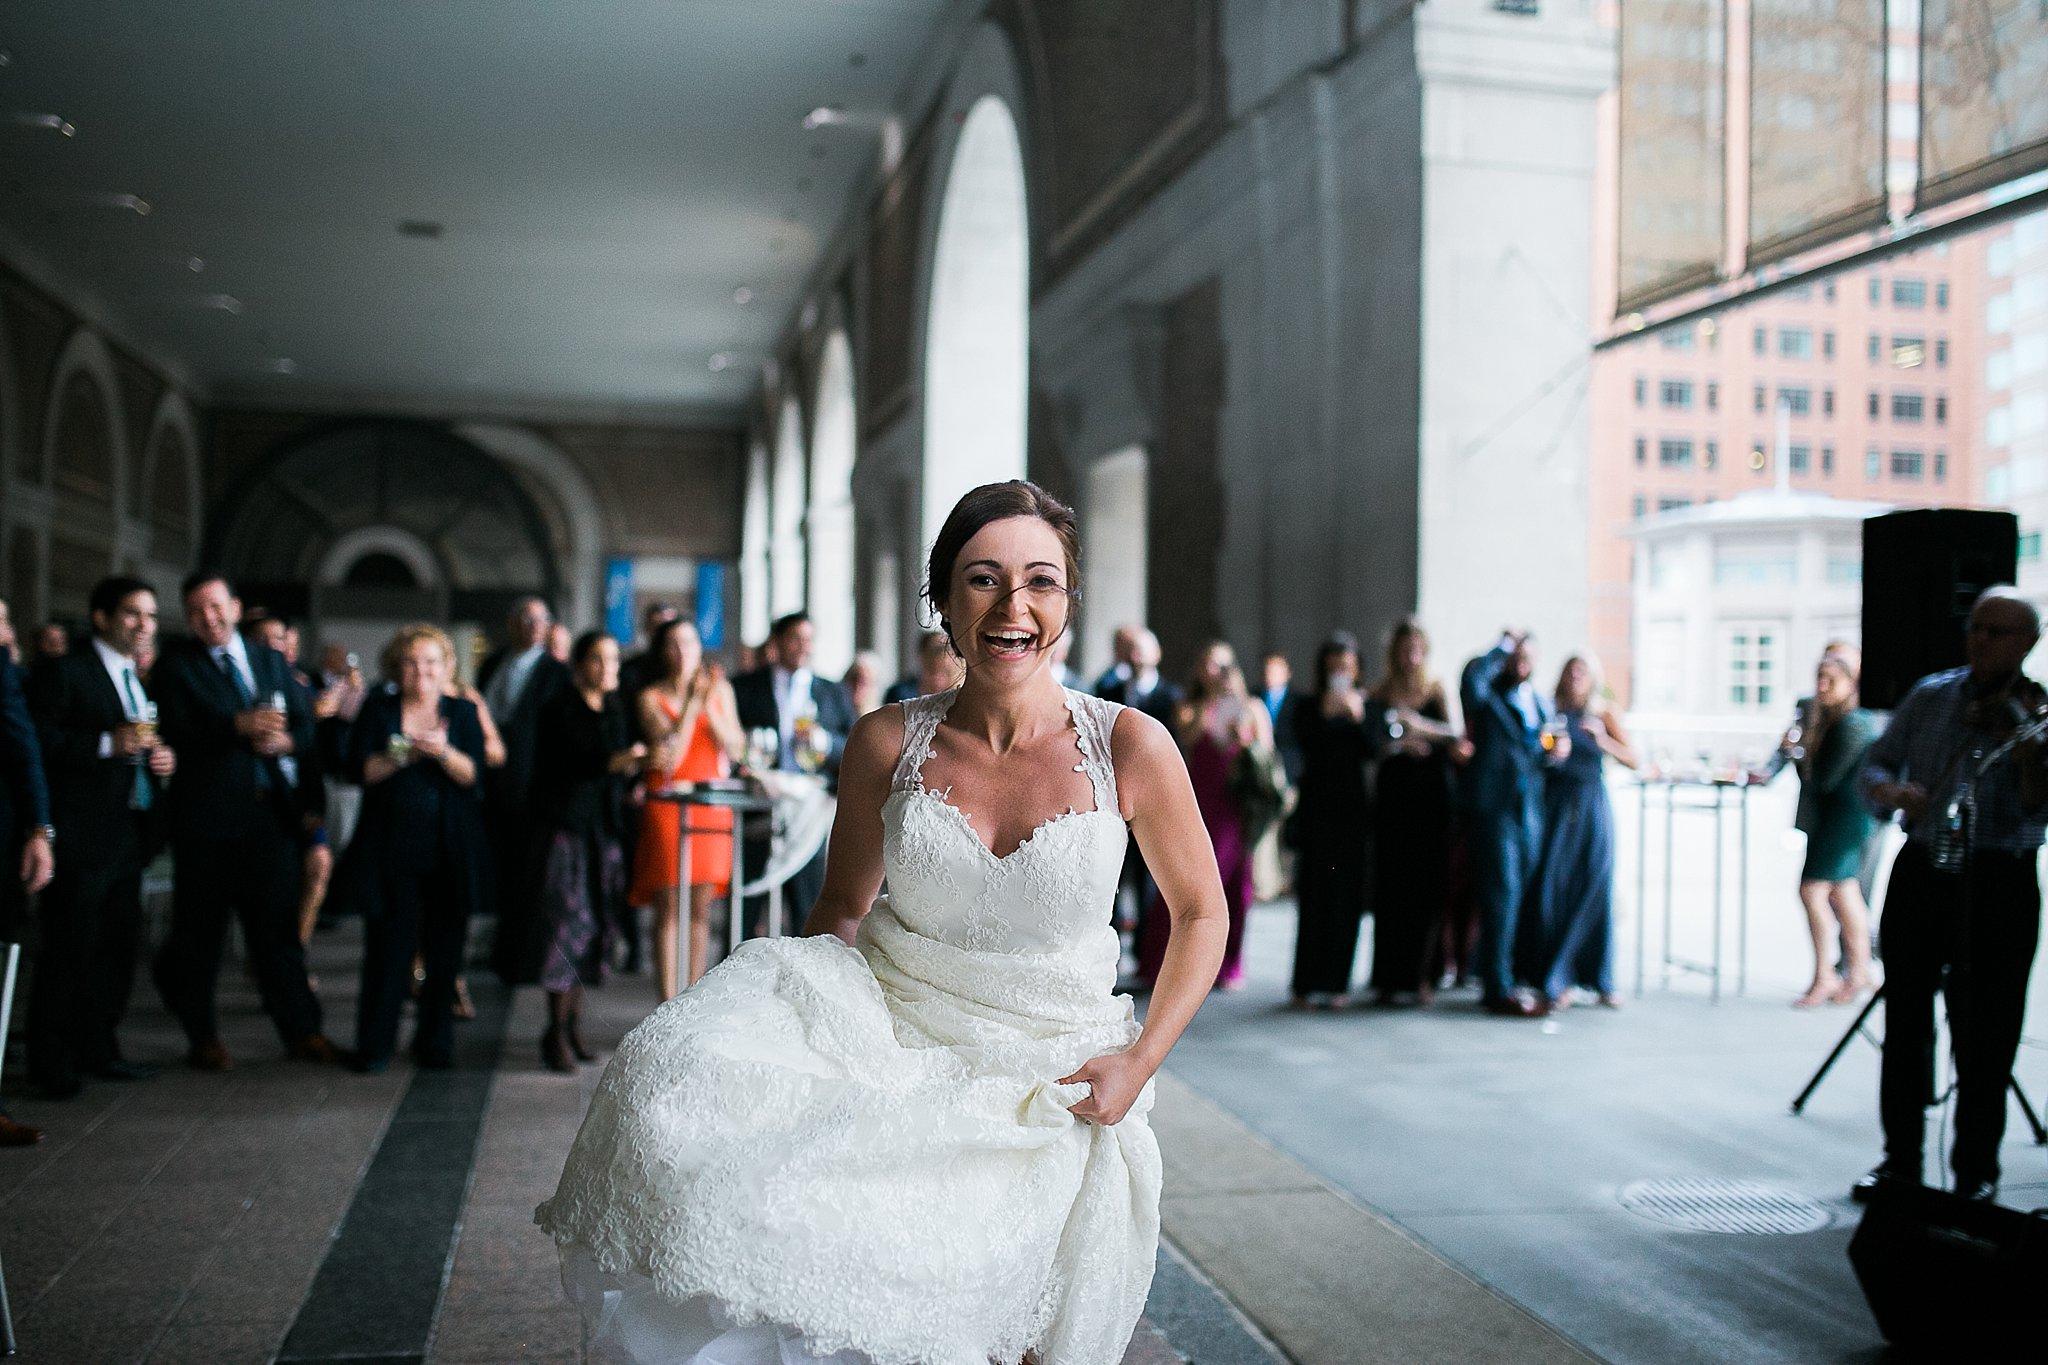 Seaport Hotel Wedding Boston Photographer Sweet Alice60.jpg